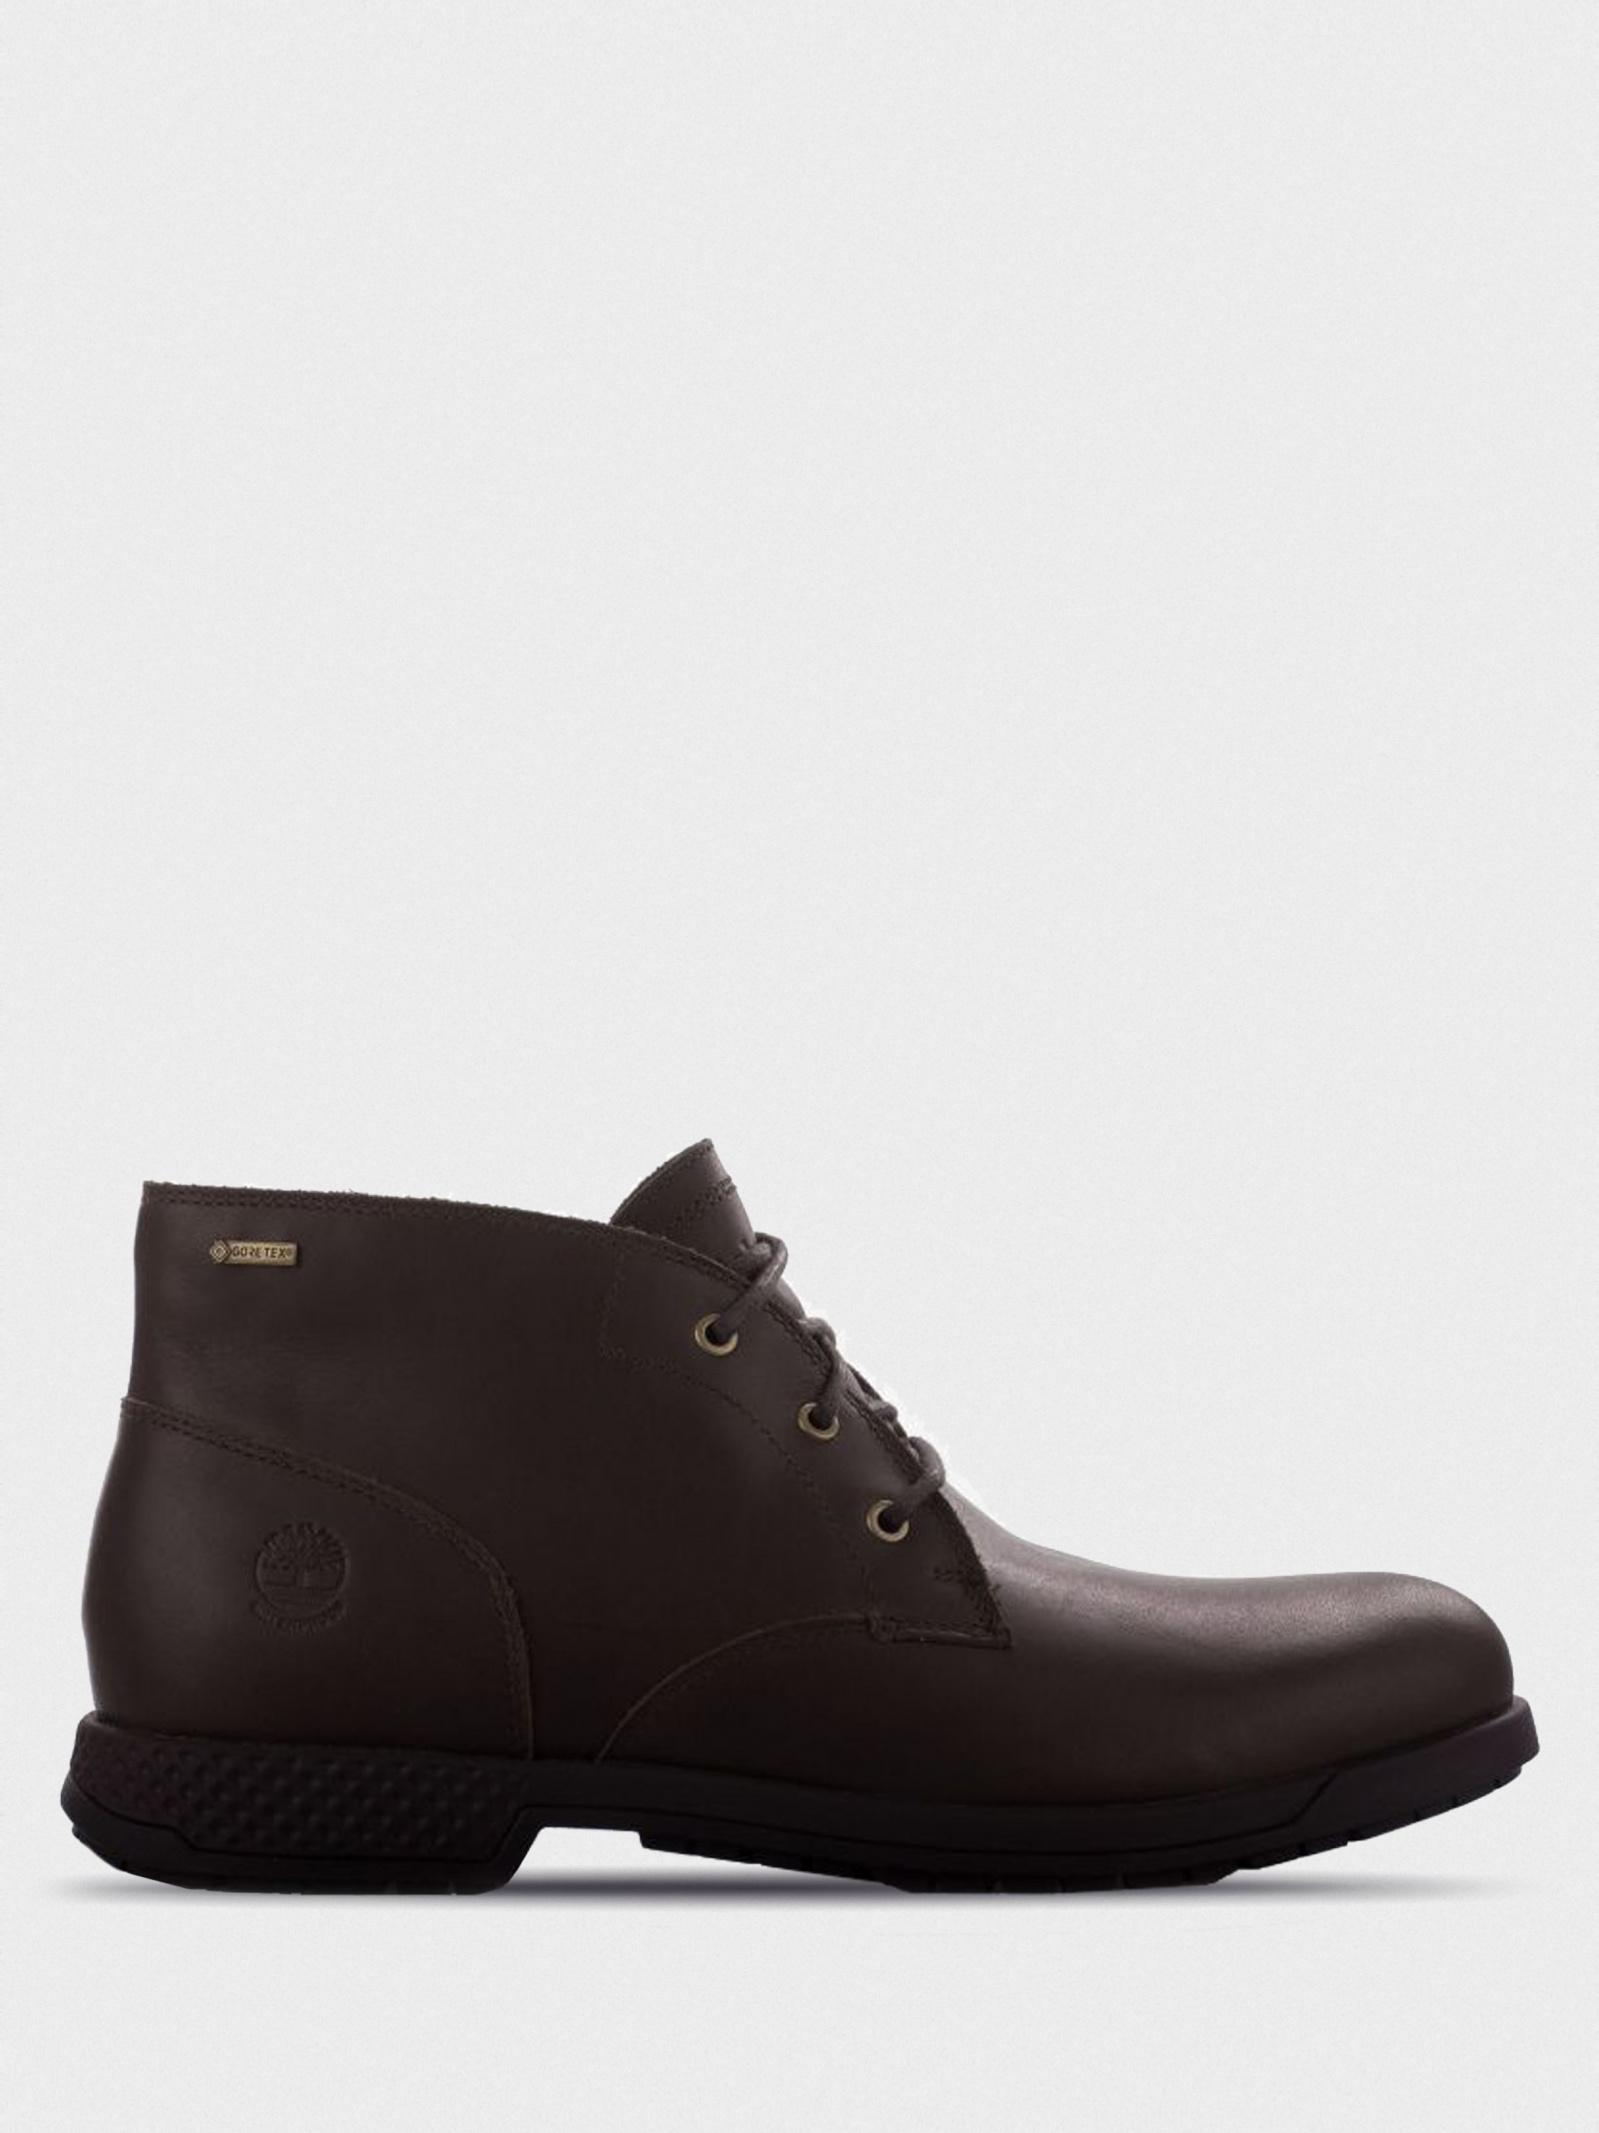 Ботинки для мужчин Timberland City's Edge TF3818 купить в Интертоп, 2017